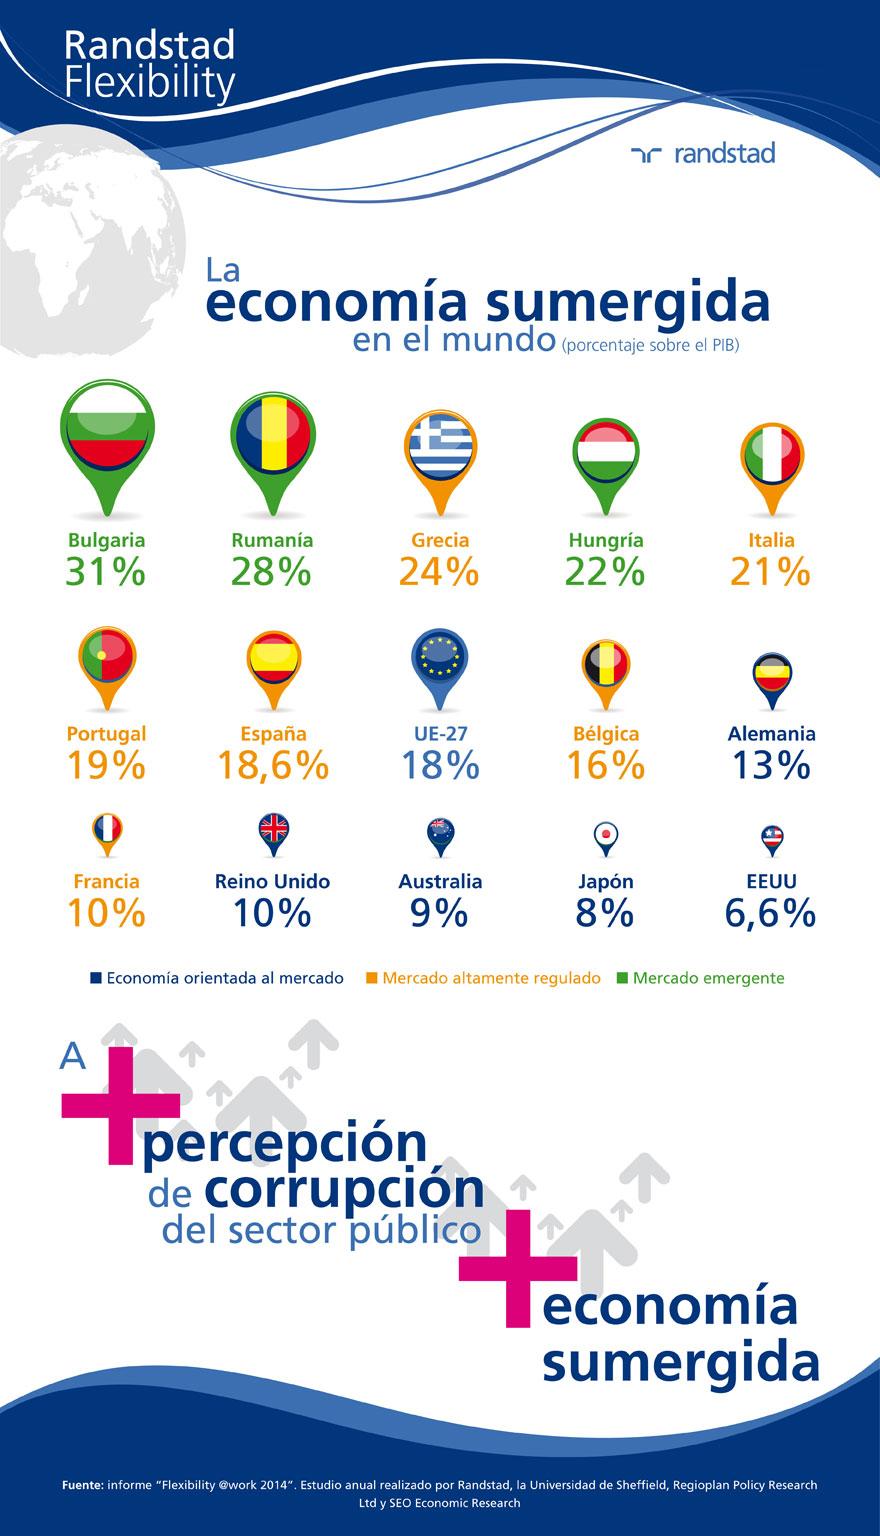 infografia-economia-sumergida-mundo-flexibility-2014.jpg